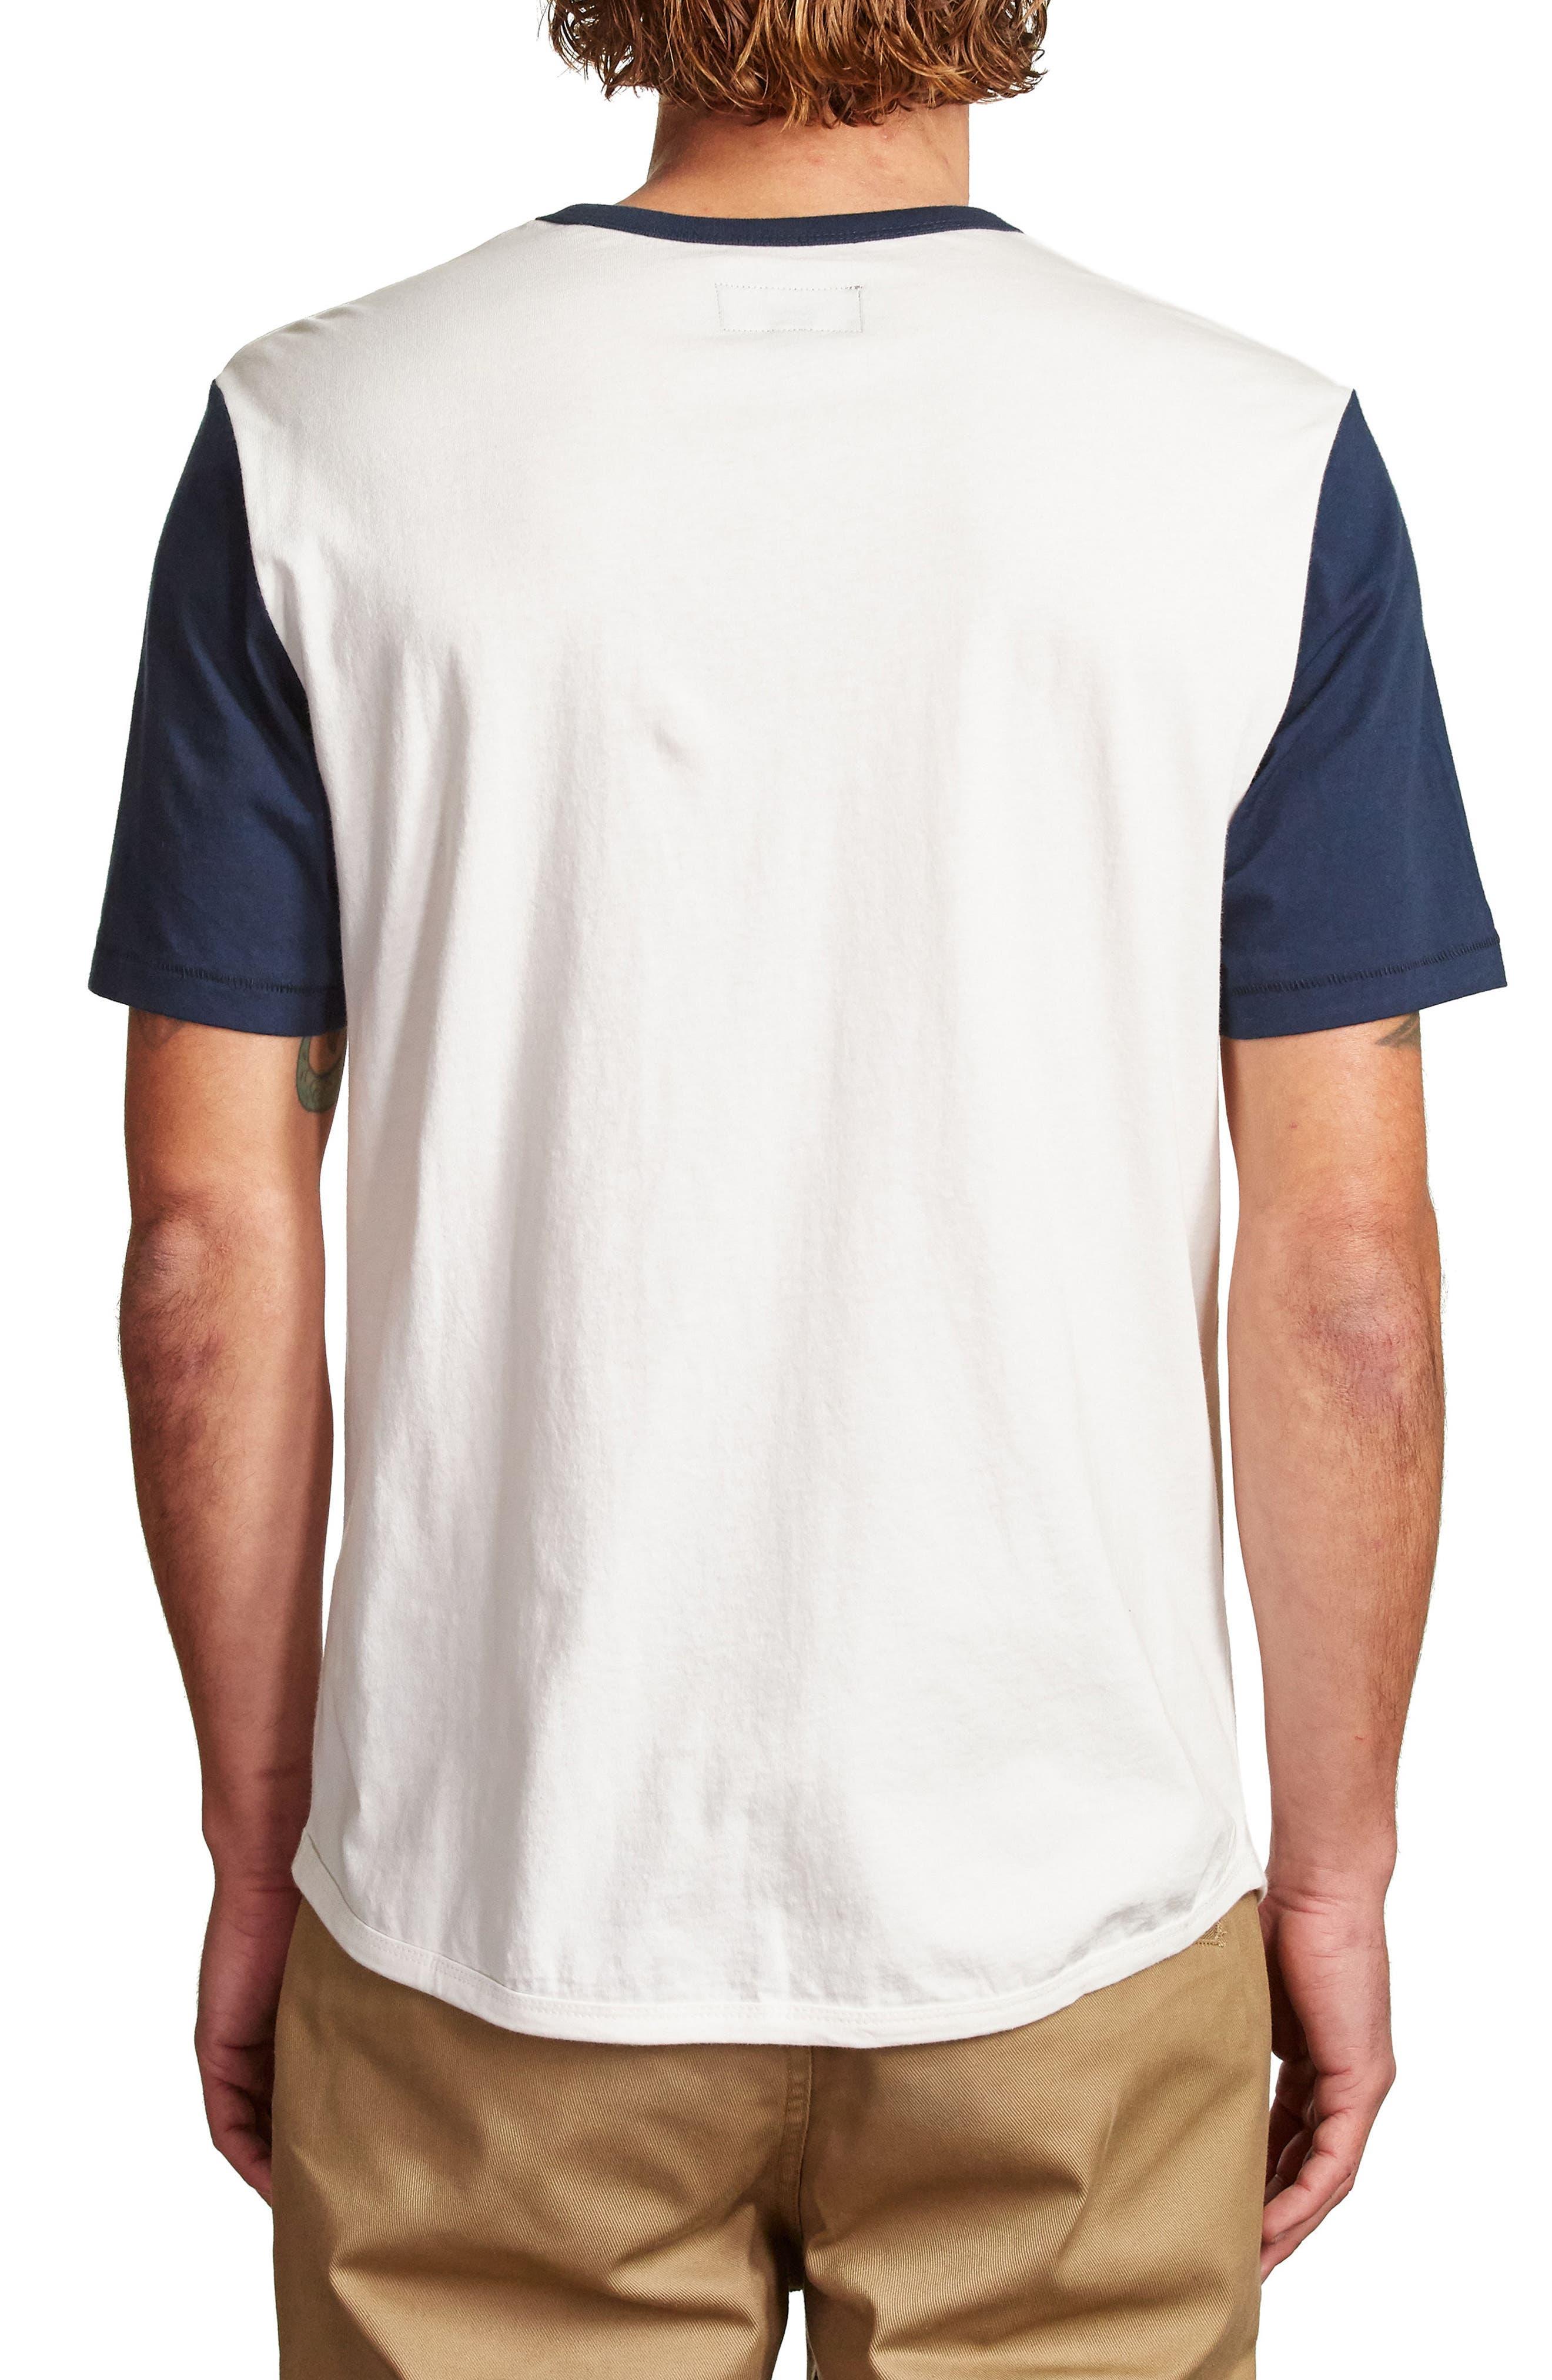 Novato T-Shirt,                             Alternate thumbnail 2, color,                             Off White/ Navy